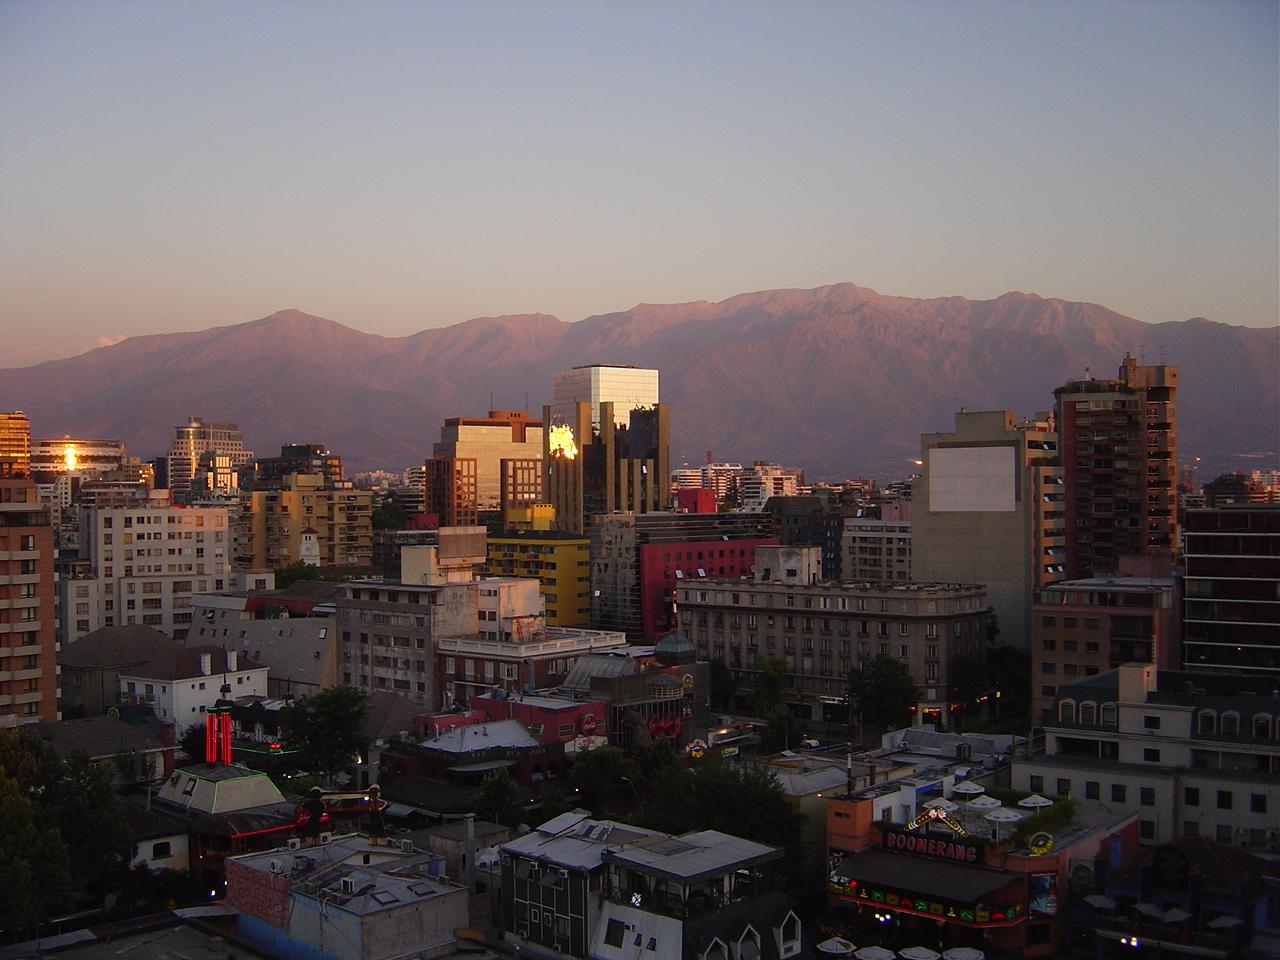 Asideclaro la po tica modernidad de chile for Papeles murales en santiago de chile